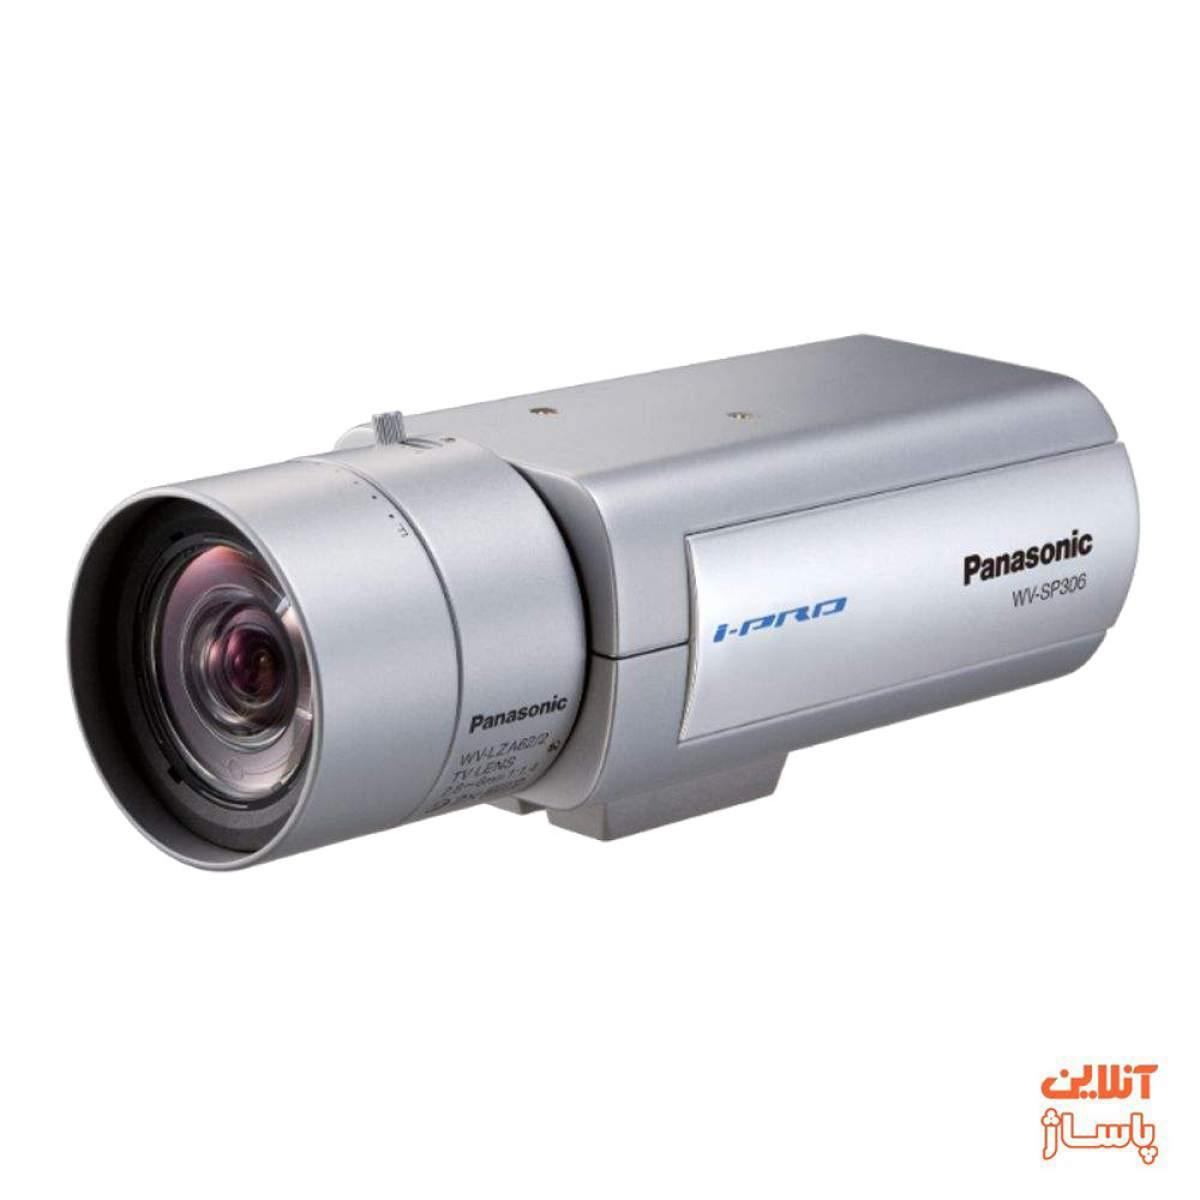 دوربین مداربسته تحت شبکه پاناسونیک مدل WV-SP306E